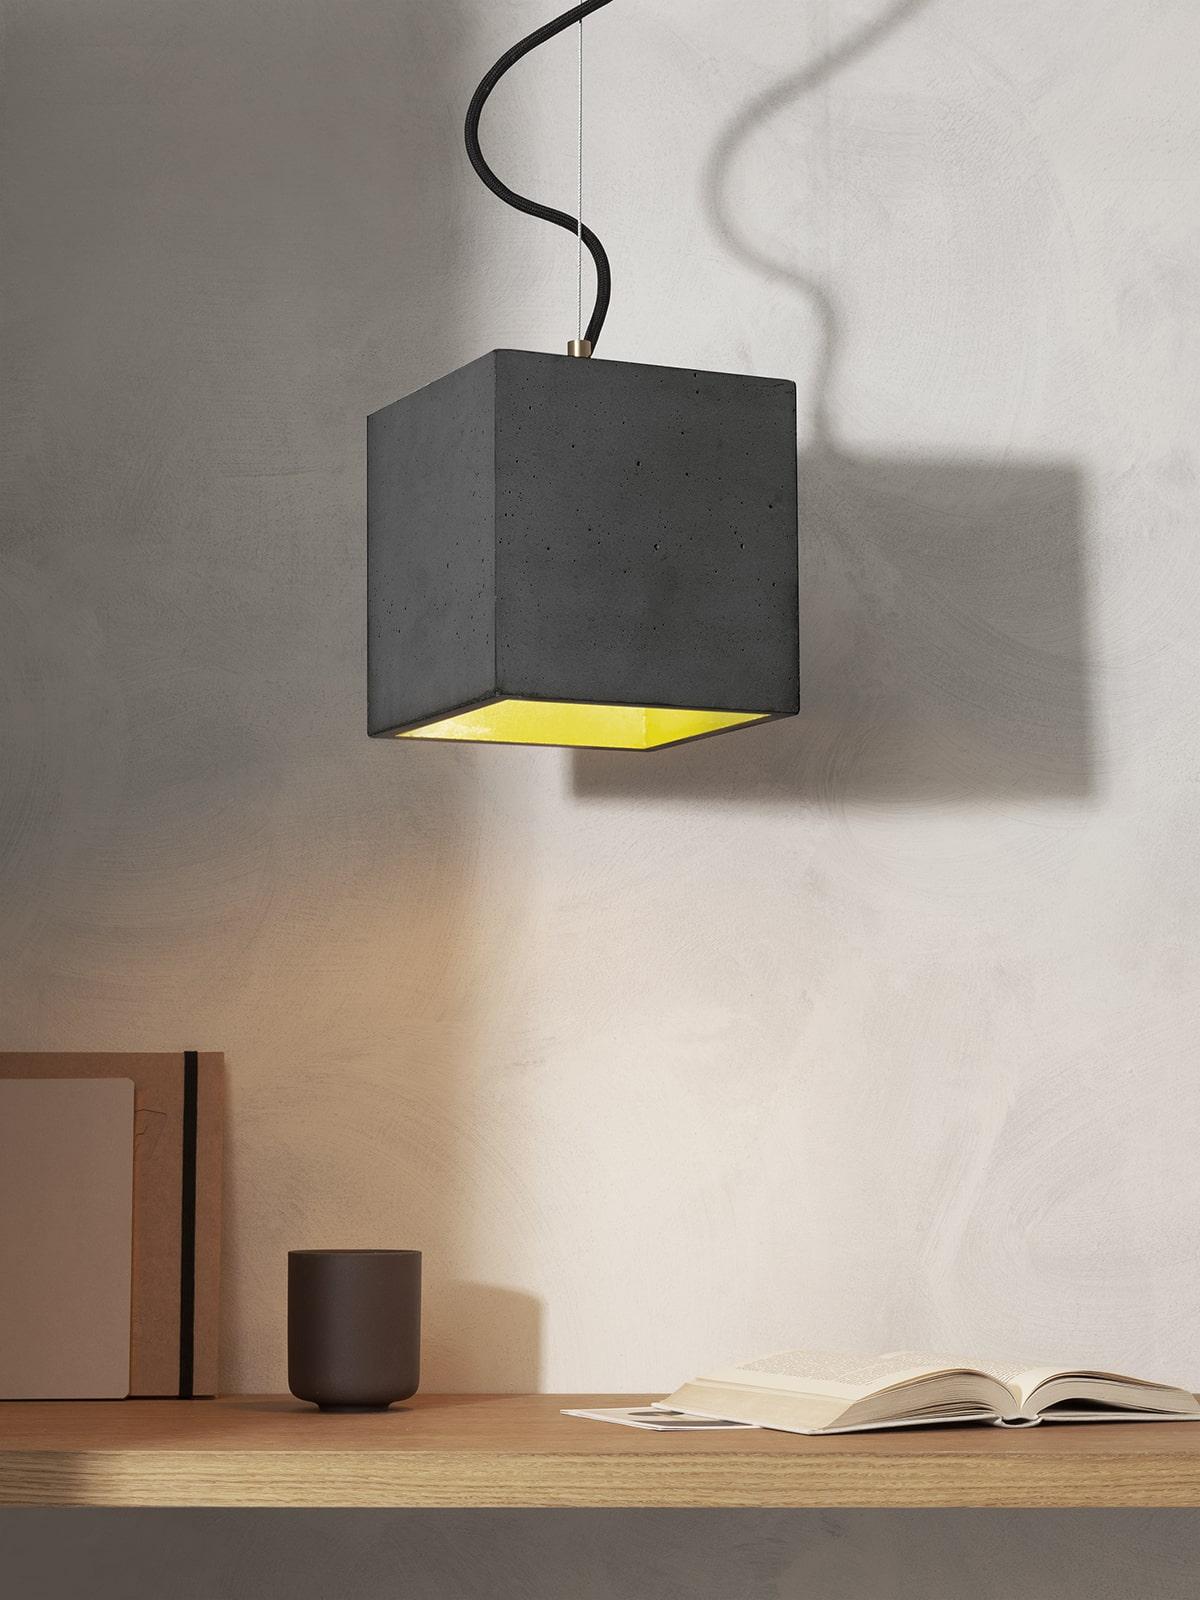 Kubustisk beton lampe